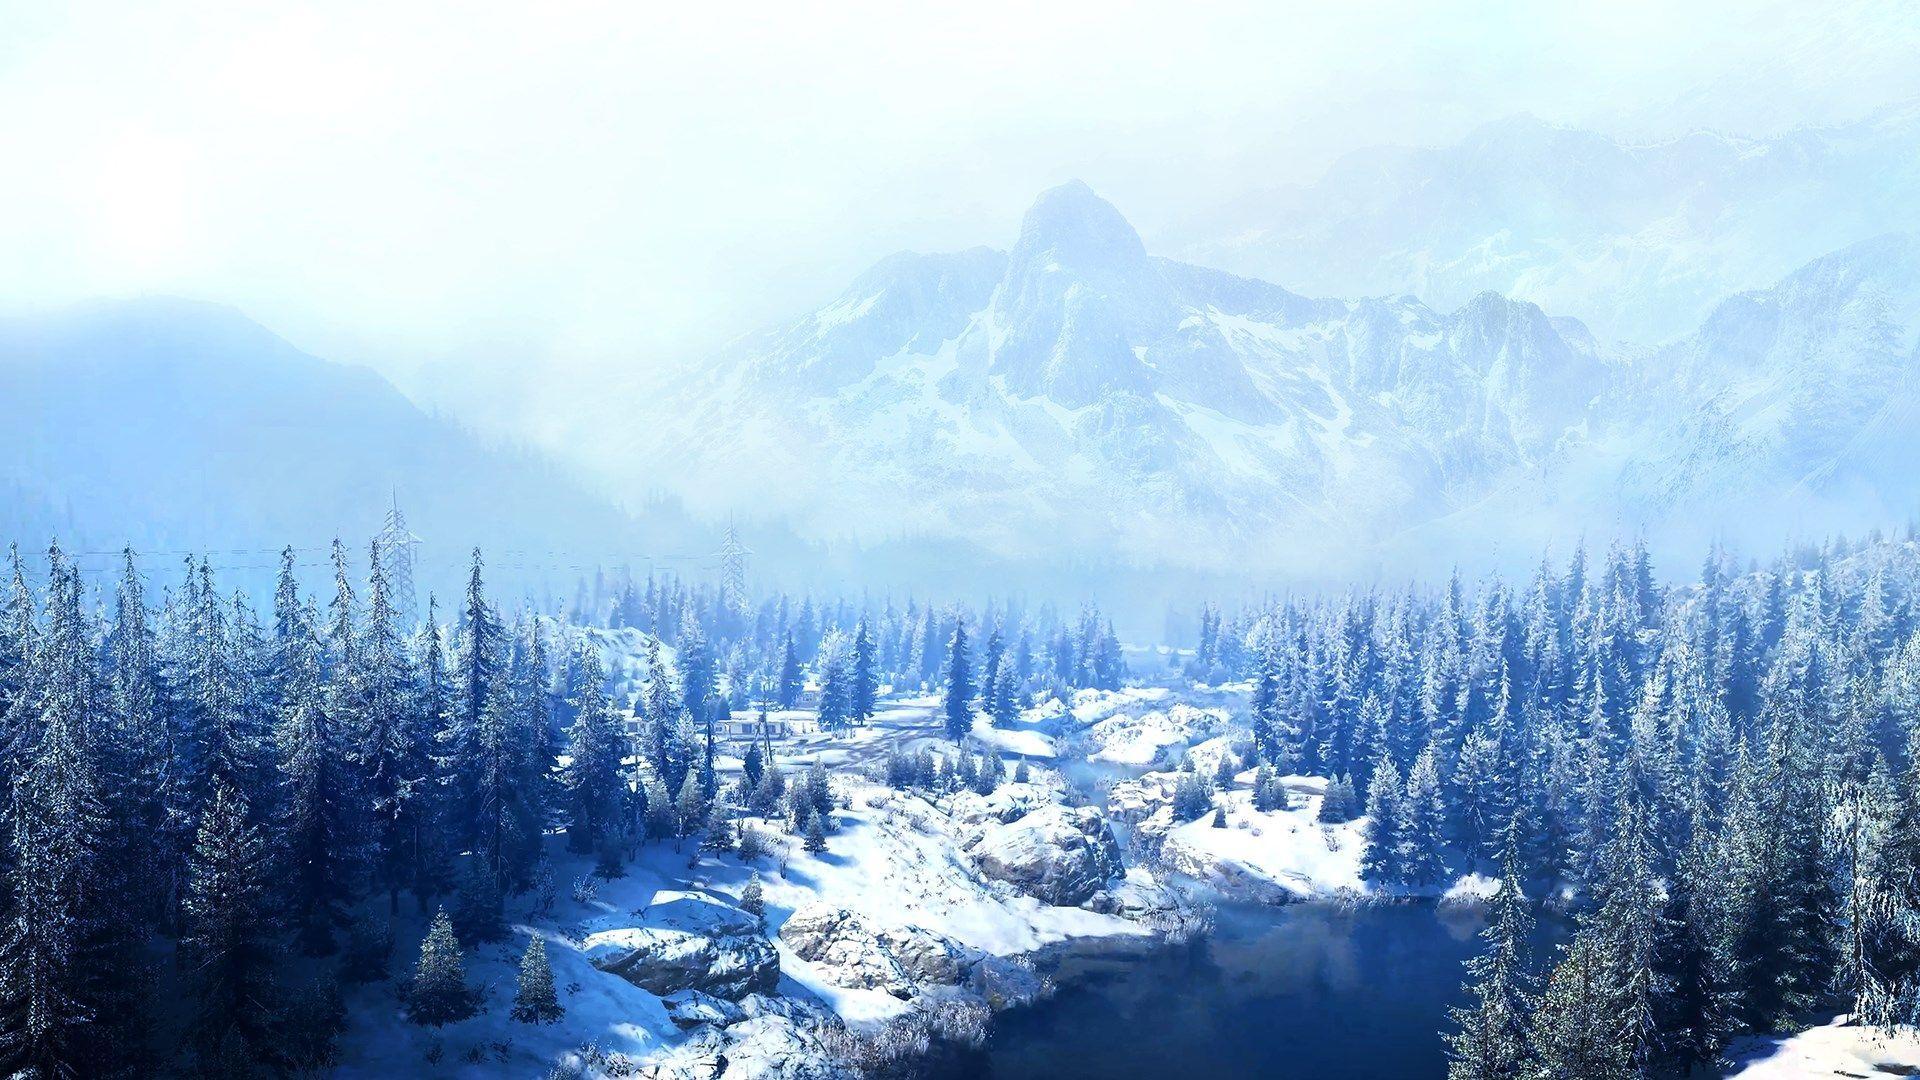 SnowRunner Wallpapers - Top Free SnowRunner Backgrounds - WallpaperAccess